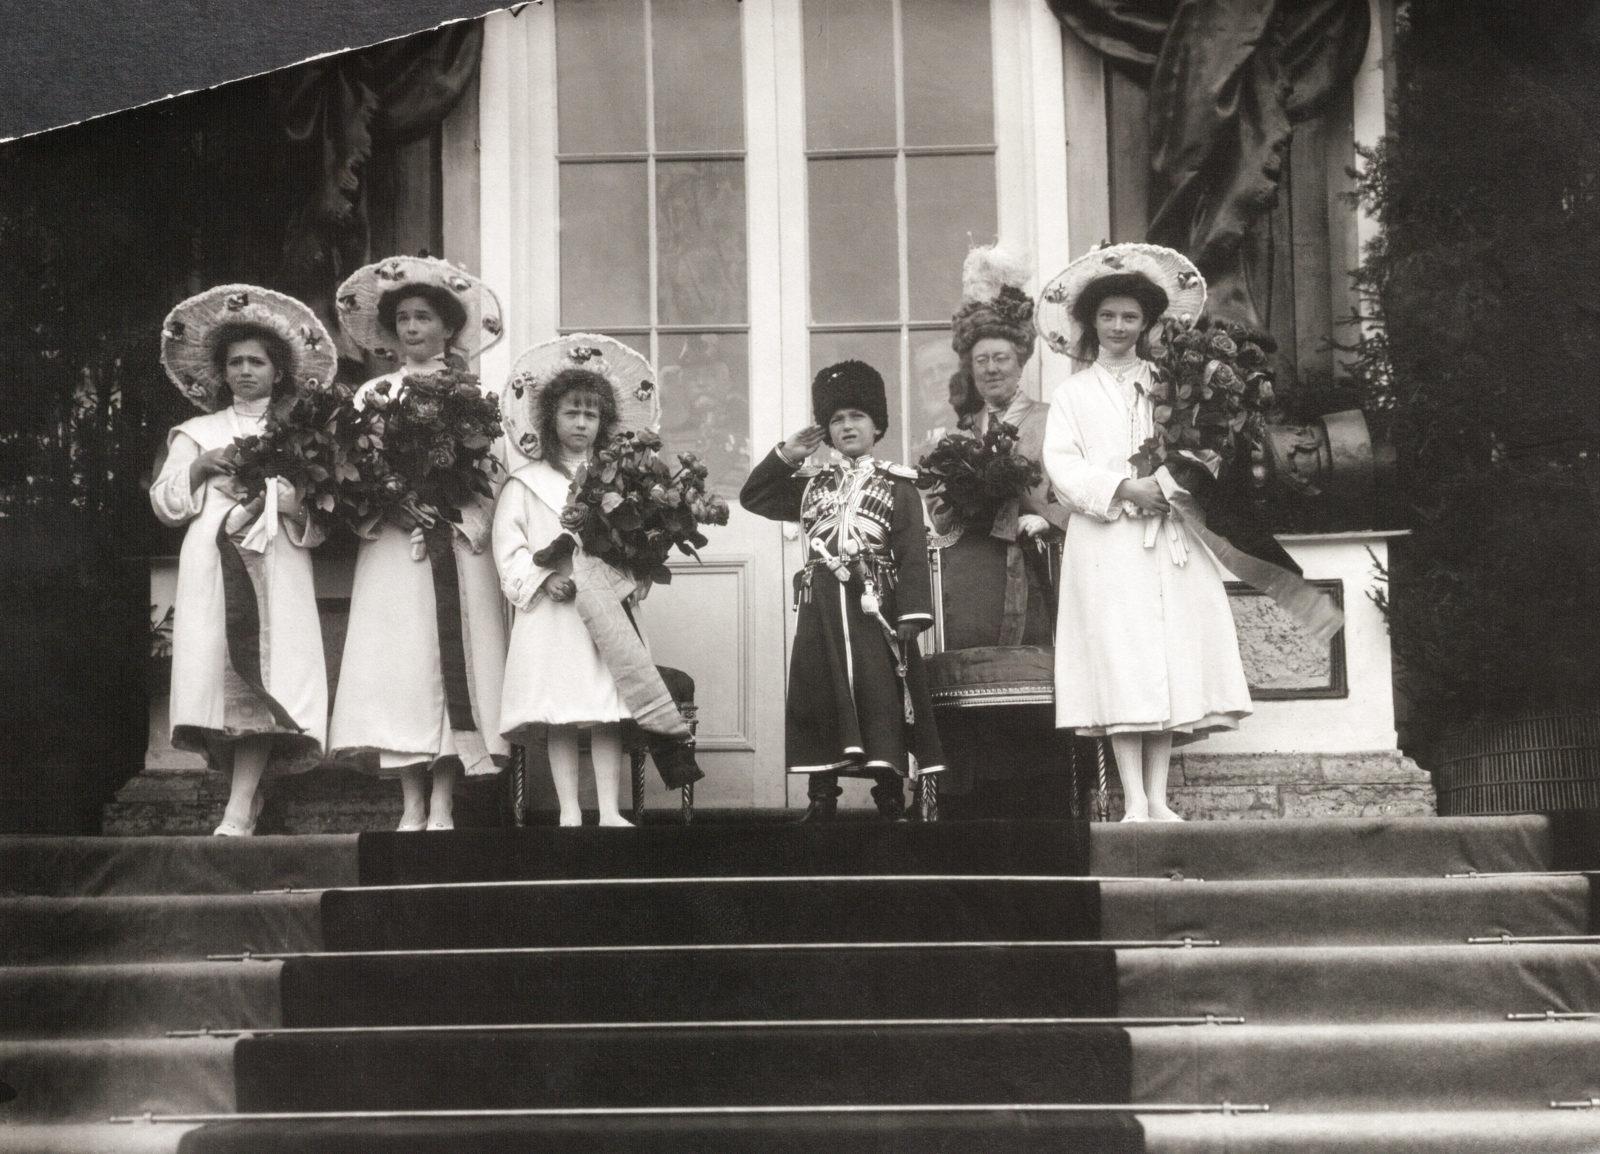 The Tsarevich Alexei and Grand Princesses Olga, Tatiana, Maria and Anastasia. Children of Emperor Nicholas II and Empress Alexandra Feodorovna.